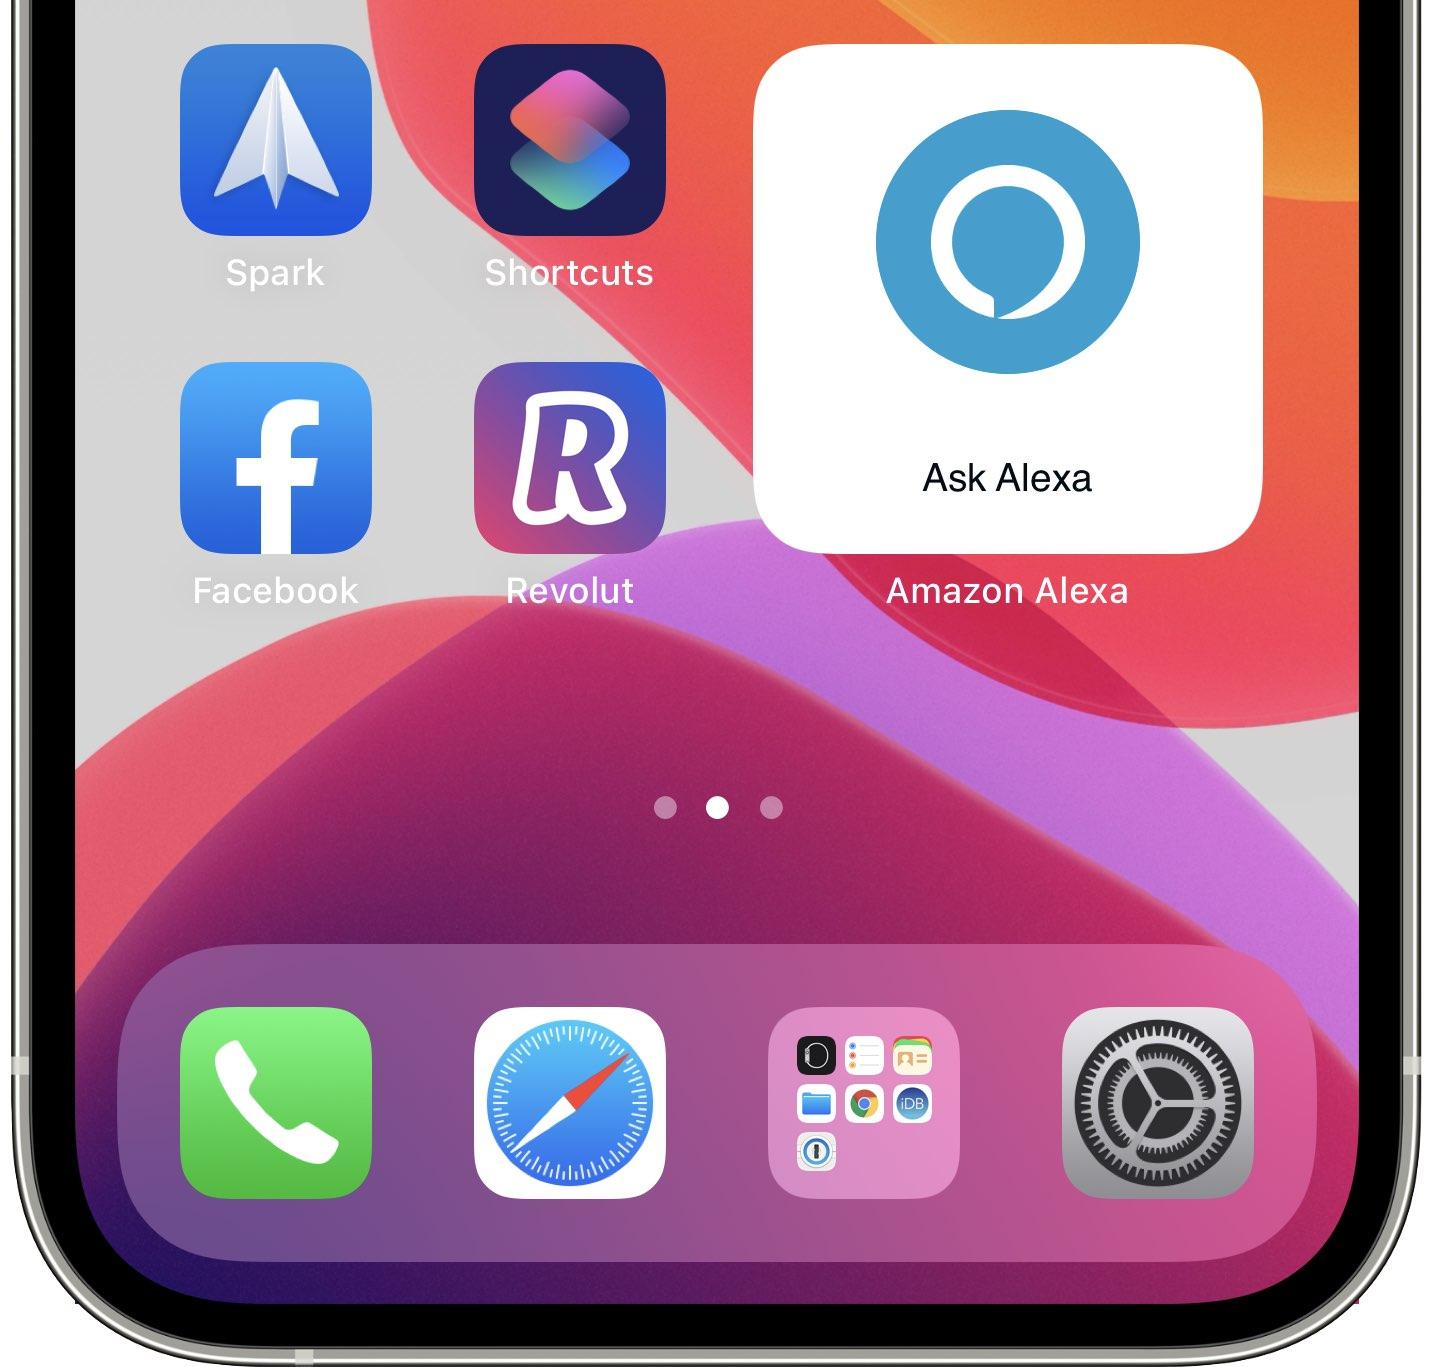 A screenshot showing Amazon's Ask Alexa widget on iPhone's home screen